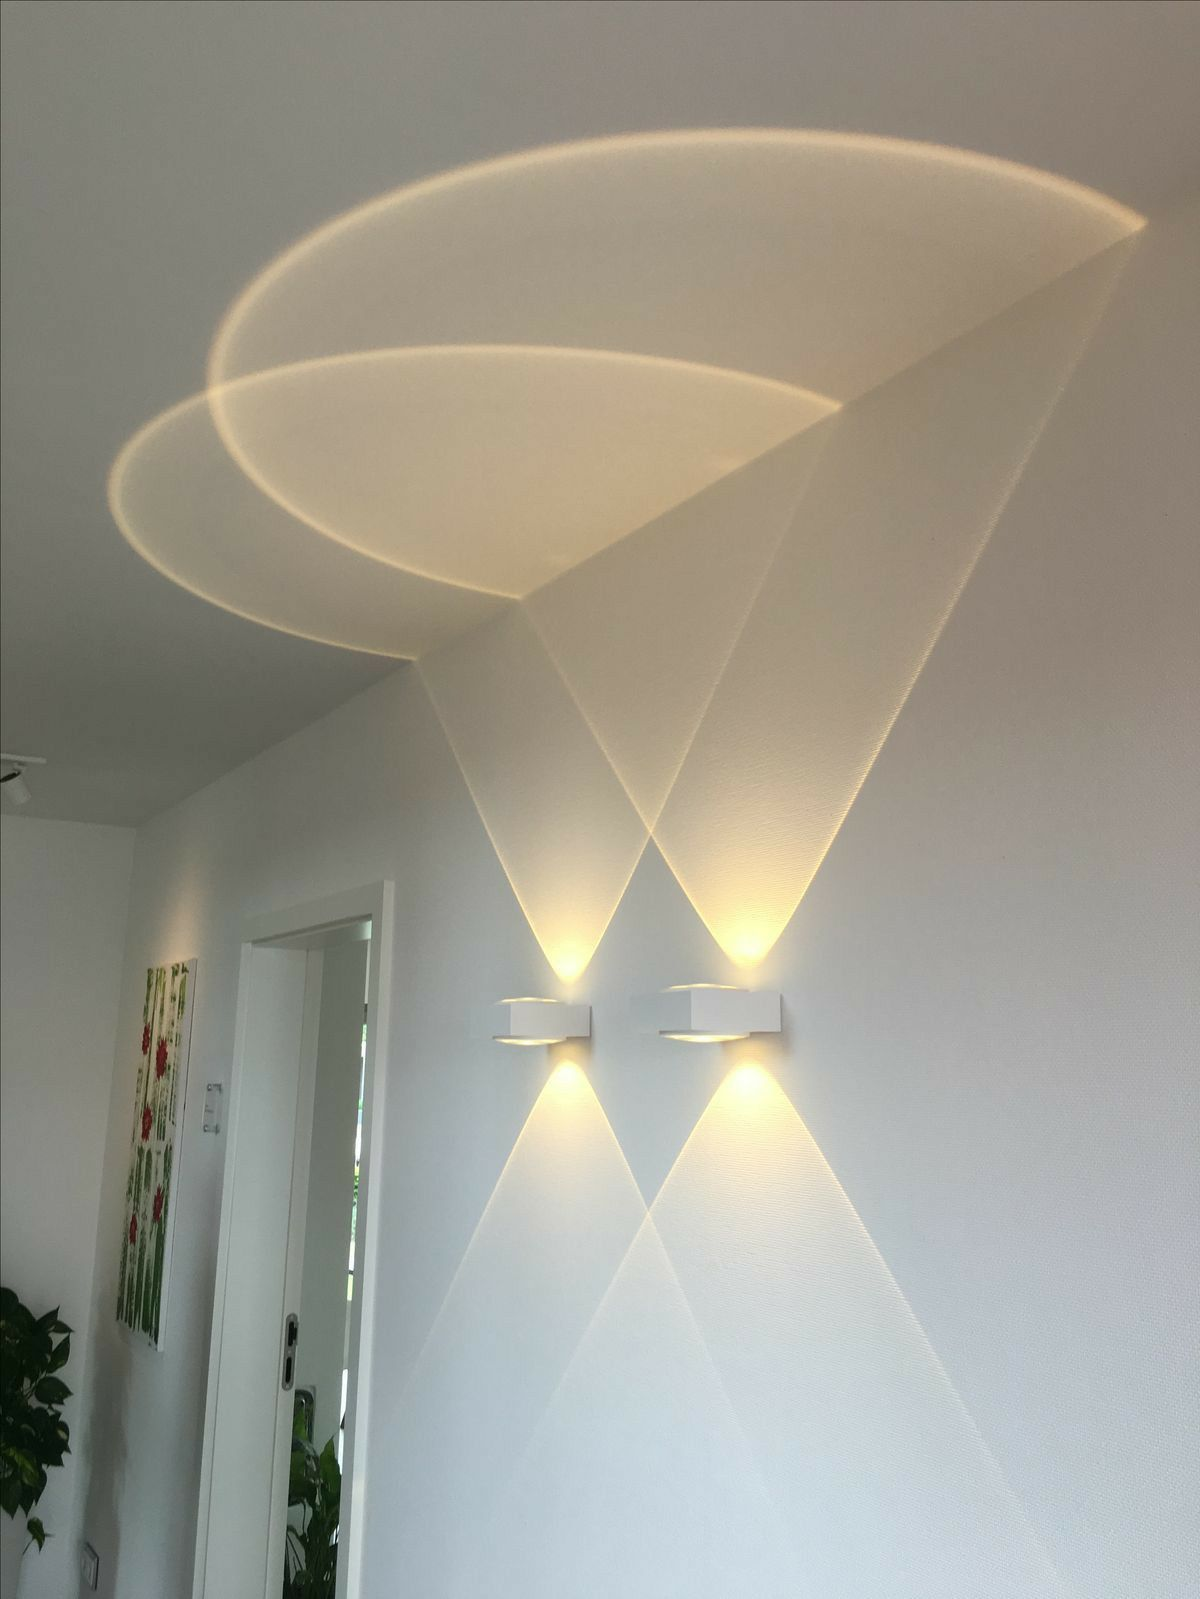 Arsuchismita I Will Give You Interior Design Ideas For 10 On Fiverr Com Wall Lighting Design Ceiling Light Design Lighting Design Interior